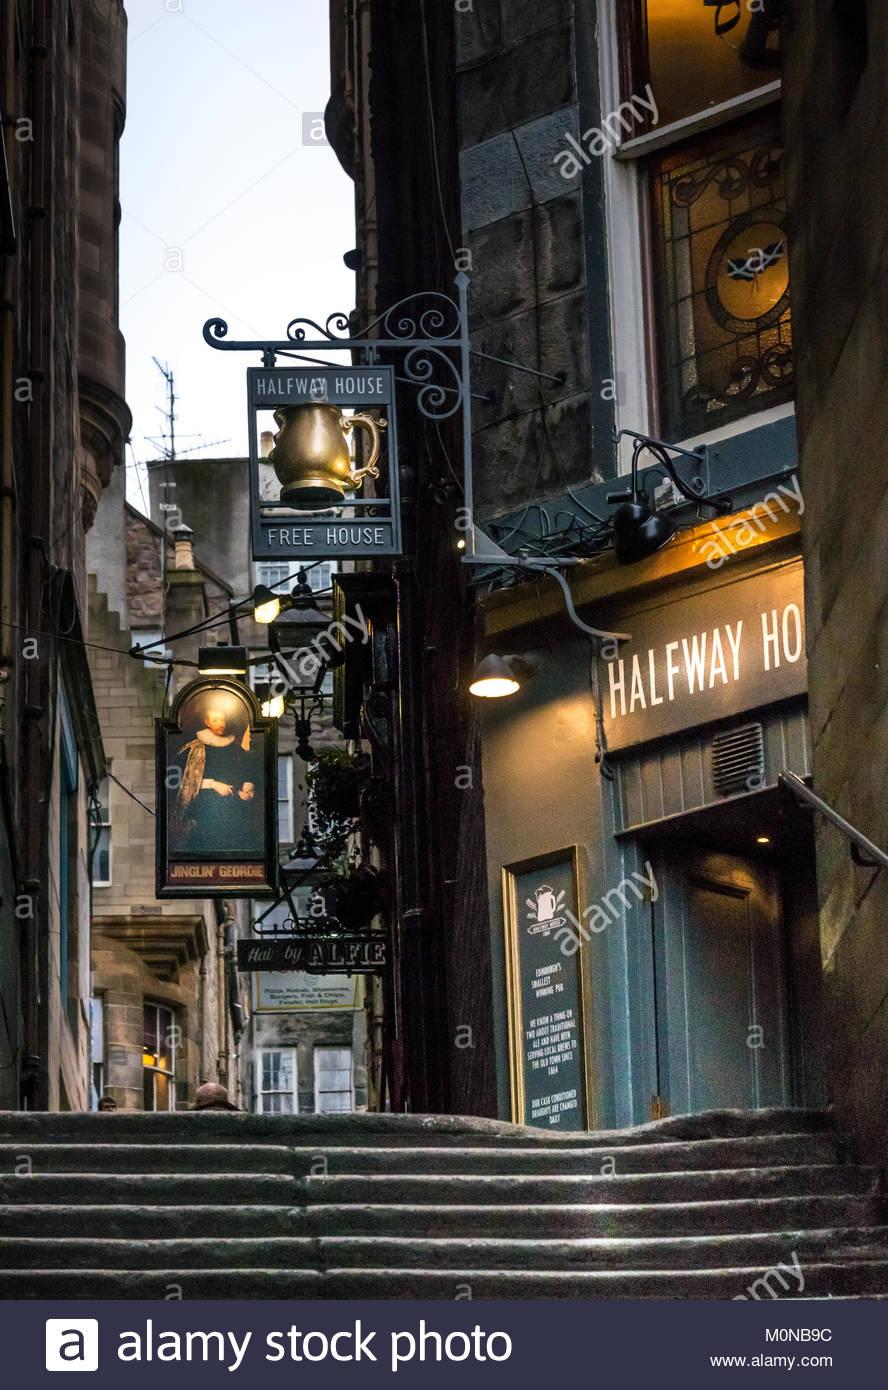 Pub signs for Jinglin Geordie and Halfway House pubs in dark alley, Fleshmarket Close, Edinburgh, Scotland, UK - Stock Image